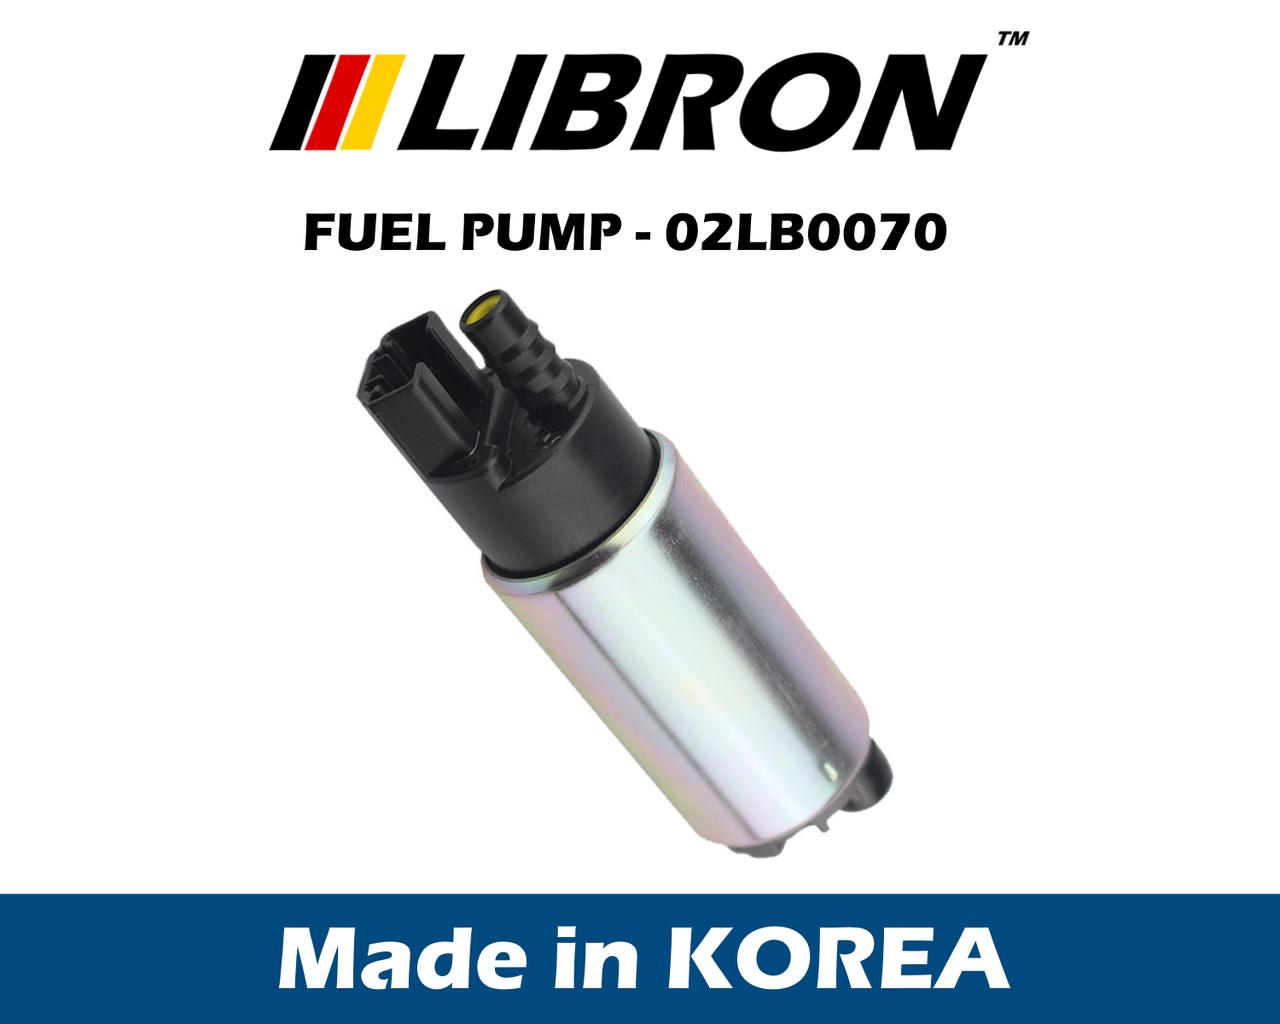 Бензонасос LIBRON 02LB0070 - MAZDA MPV I (LV) (1989-1999)